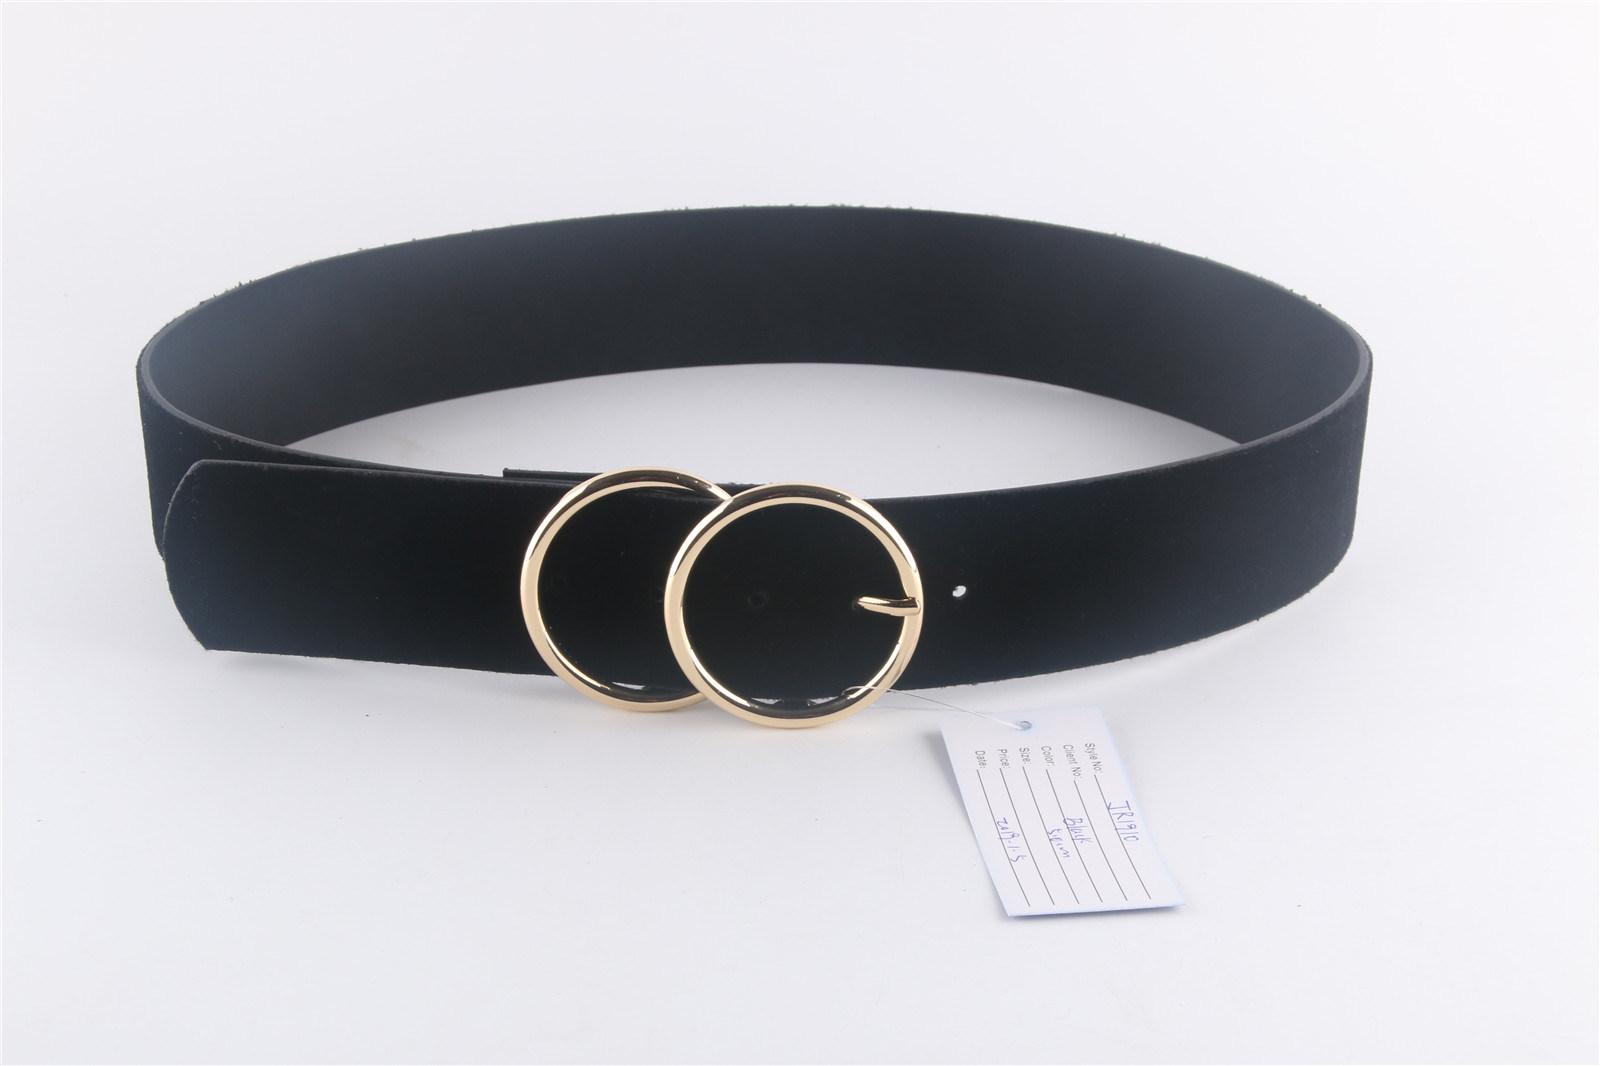 f254449dda1 China Fashion Double Round Buckle Belts with Black Velvet PU - China Belt,  PU Belts